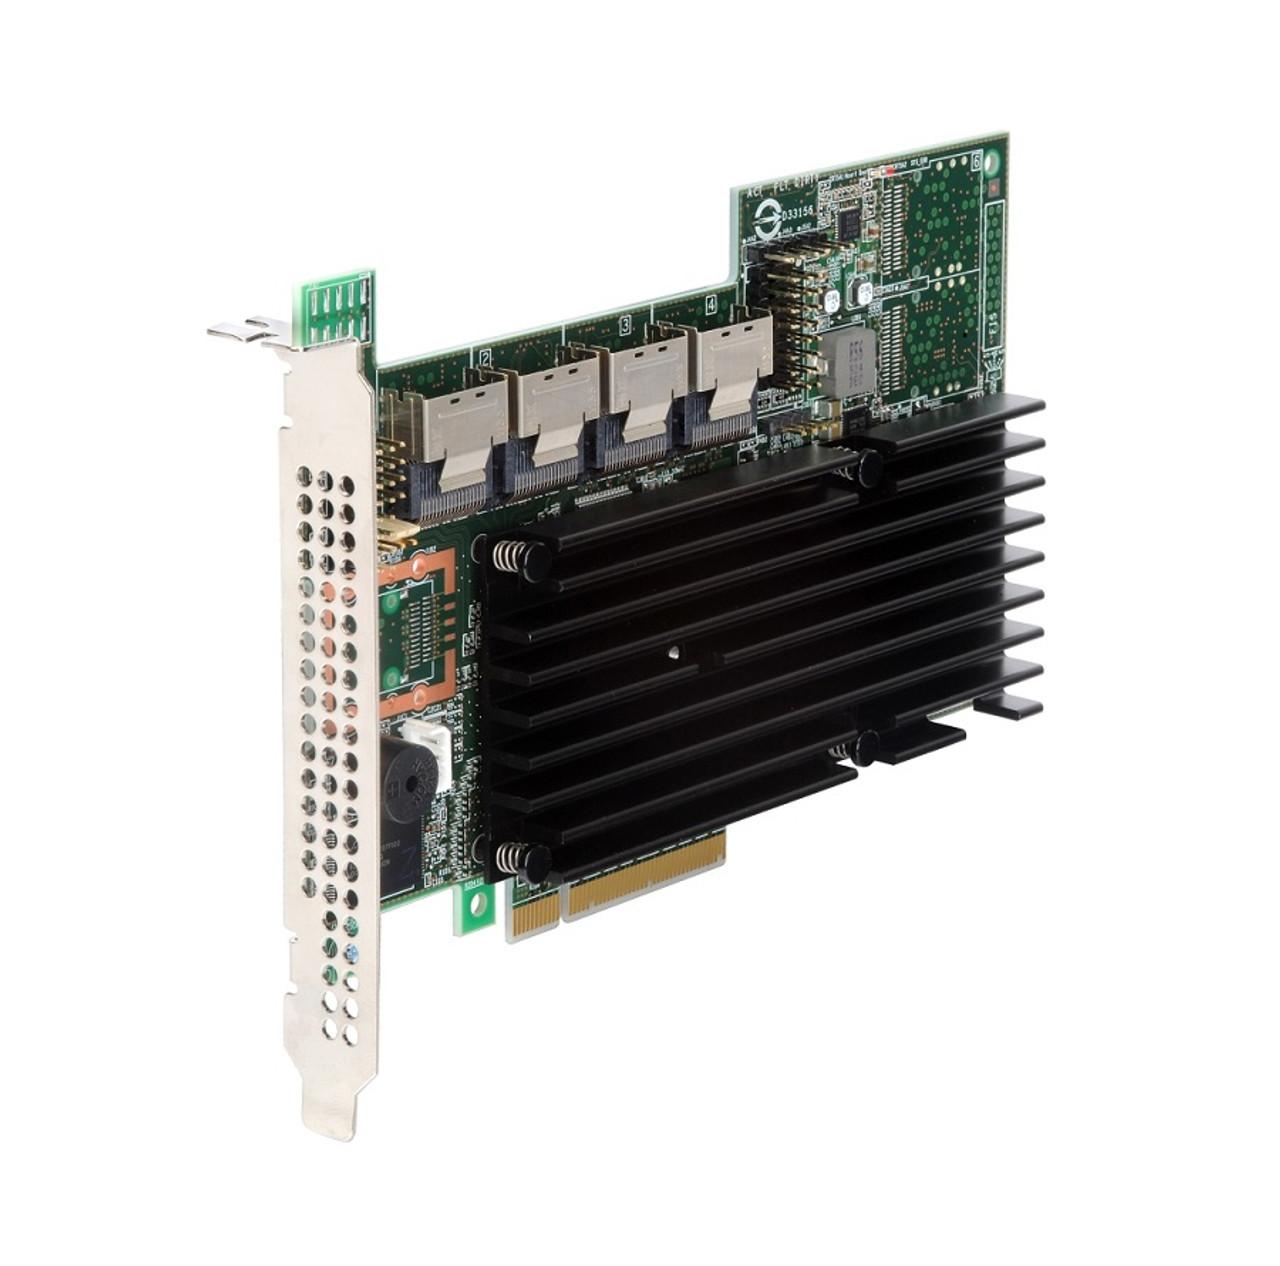 Part No: 03P0R3 - Dell Perc H310 Adapter 6bps SAS SATA Raid Controller